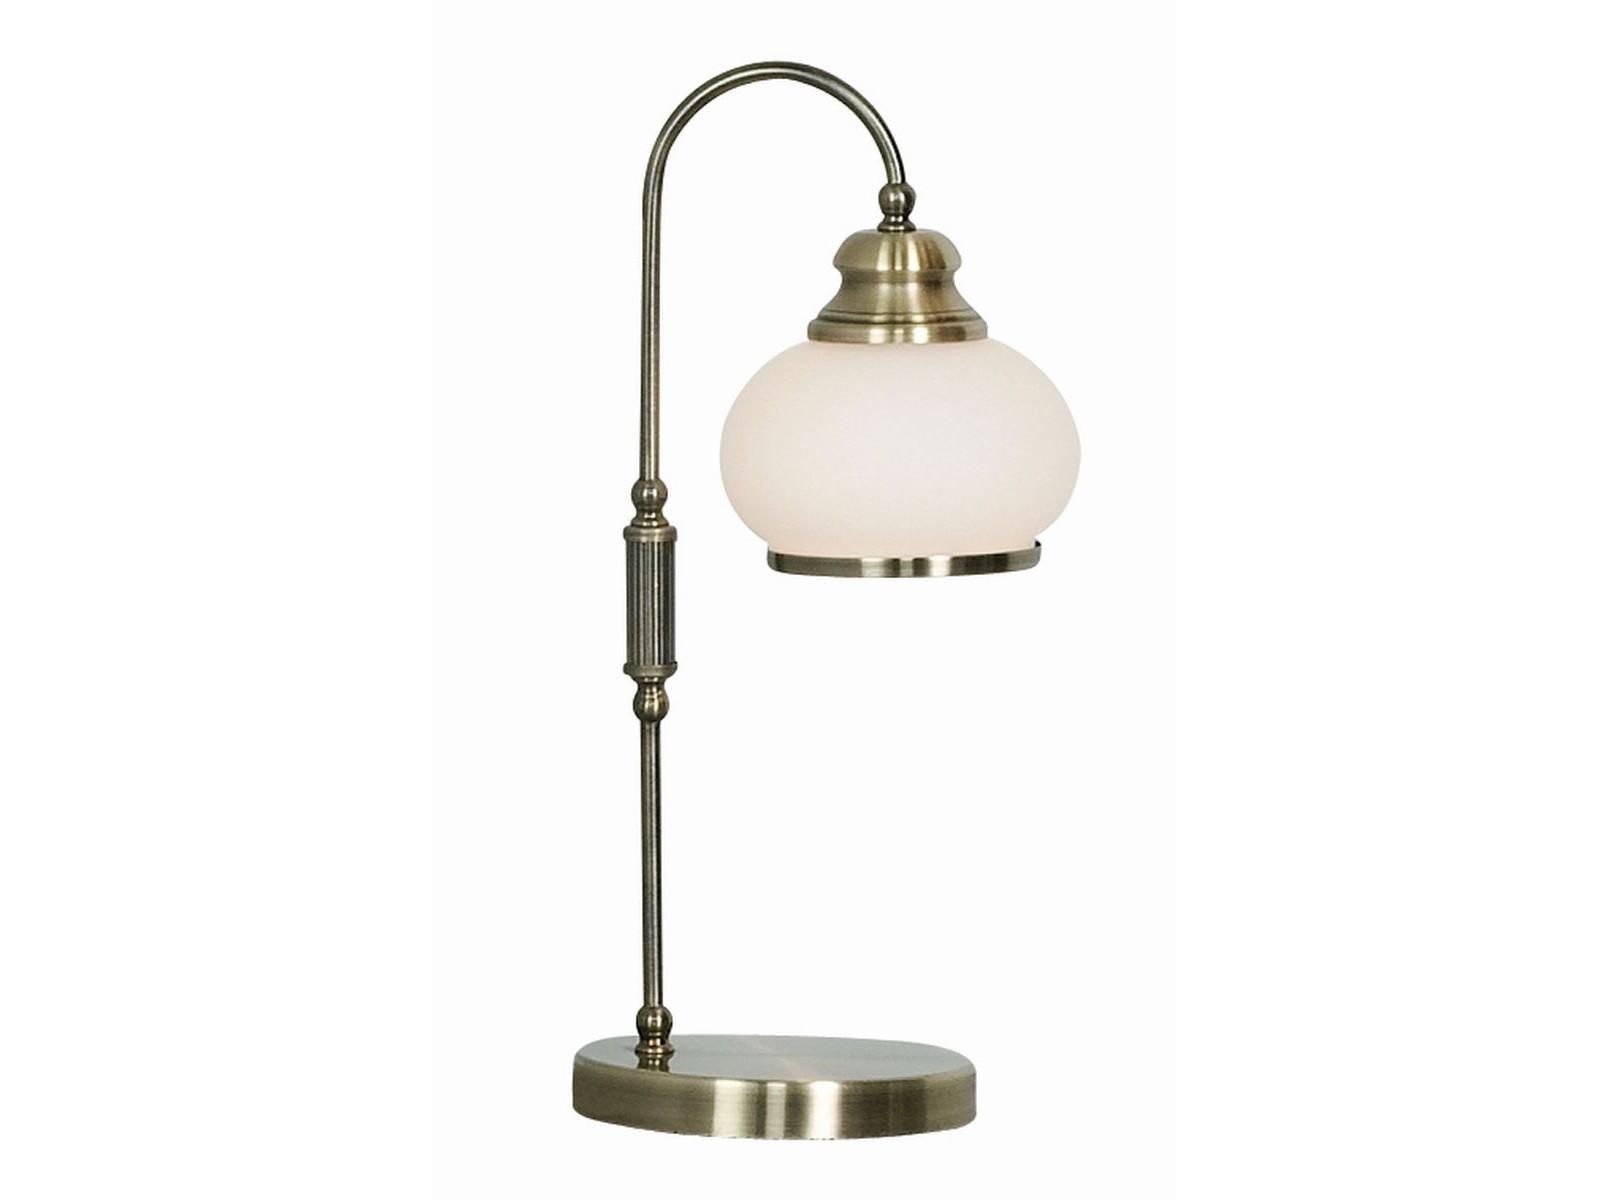 Настольная лампаДекоративные лампы<br>&amp;lt;div&amp;gt;Вид цоколя: E14&amp;lt;/div&amp;gt;&amp;lt;div&amp;gt;Мощность ламп: 40W&amp;lt;/div&amp;gt;&amp;lt;div&amp;gt;Количество ламп: 1&amp;lt;/div&amp;gt;&amp;lt;div&amp;gt;Наличие ламп: нет&amp;lt;/div&amp;gt;<br><br>Material: Металл<br>Width см: 18<br>Depth см: 14<br>Height см: 40